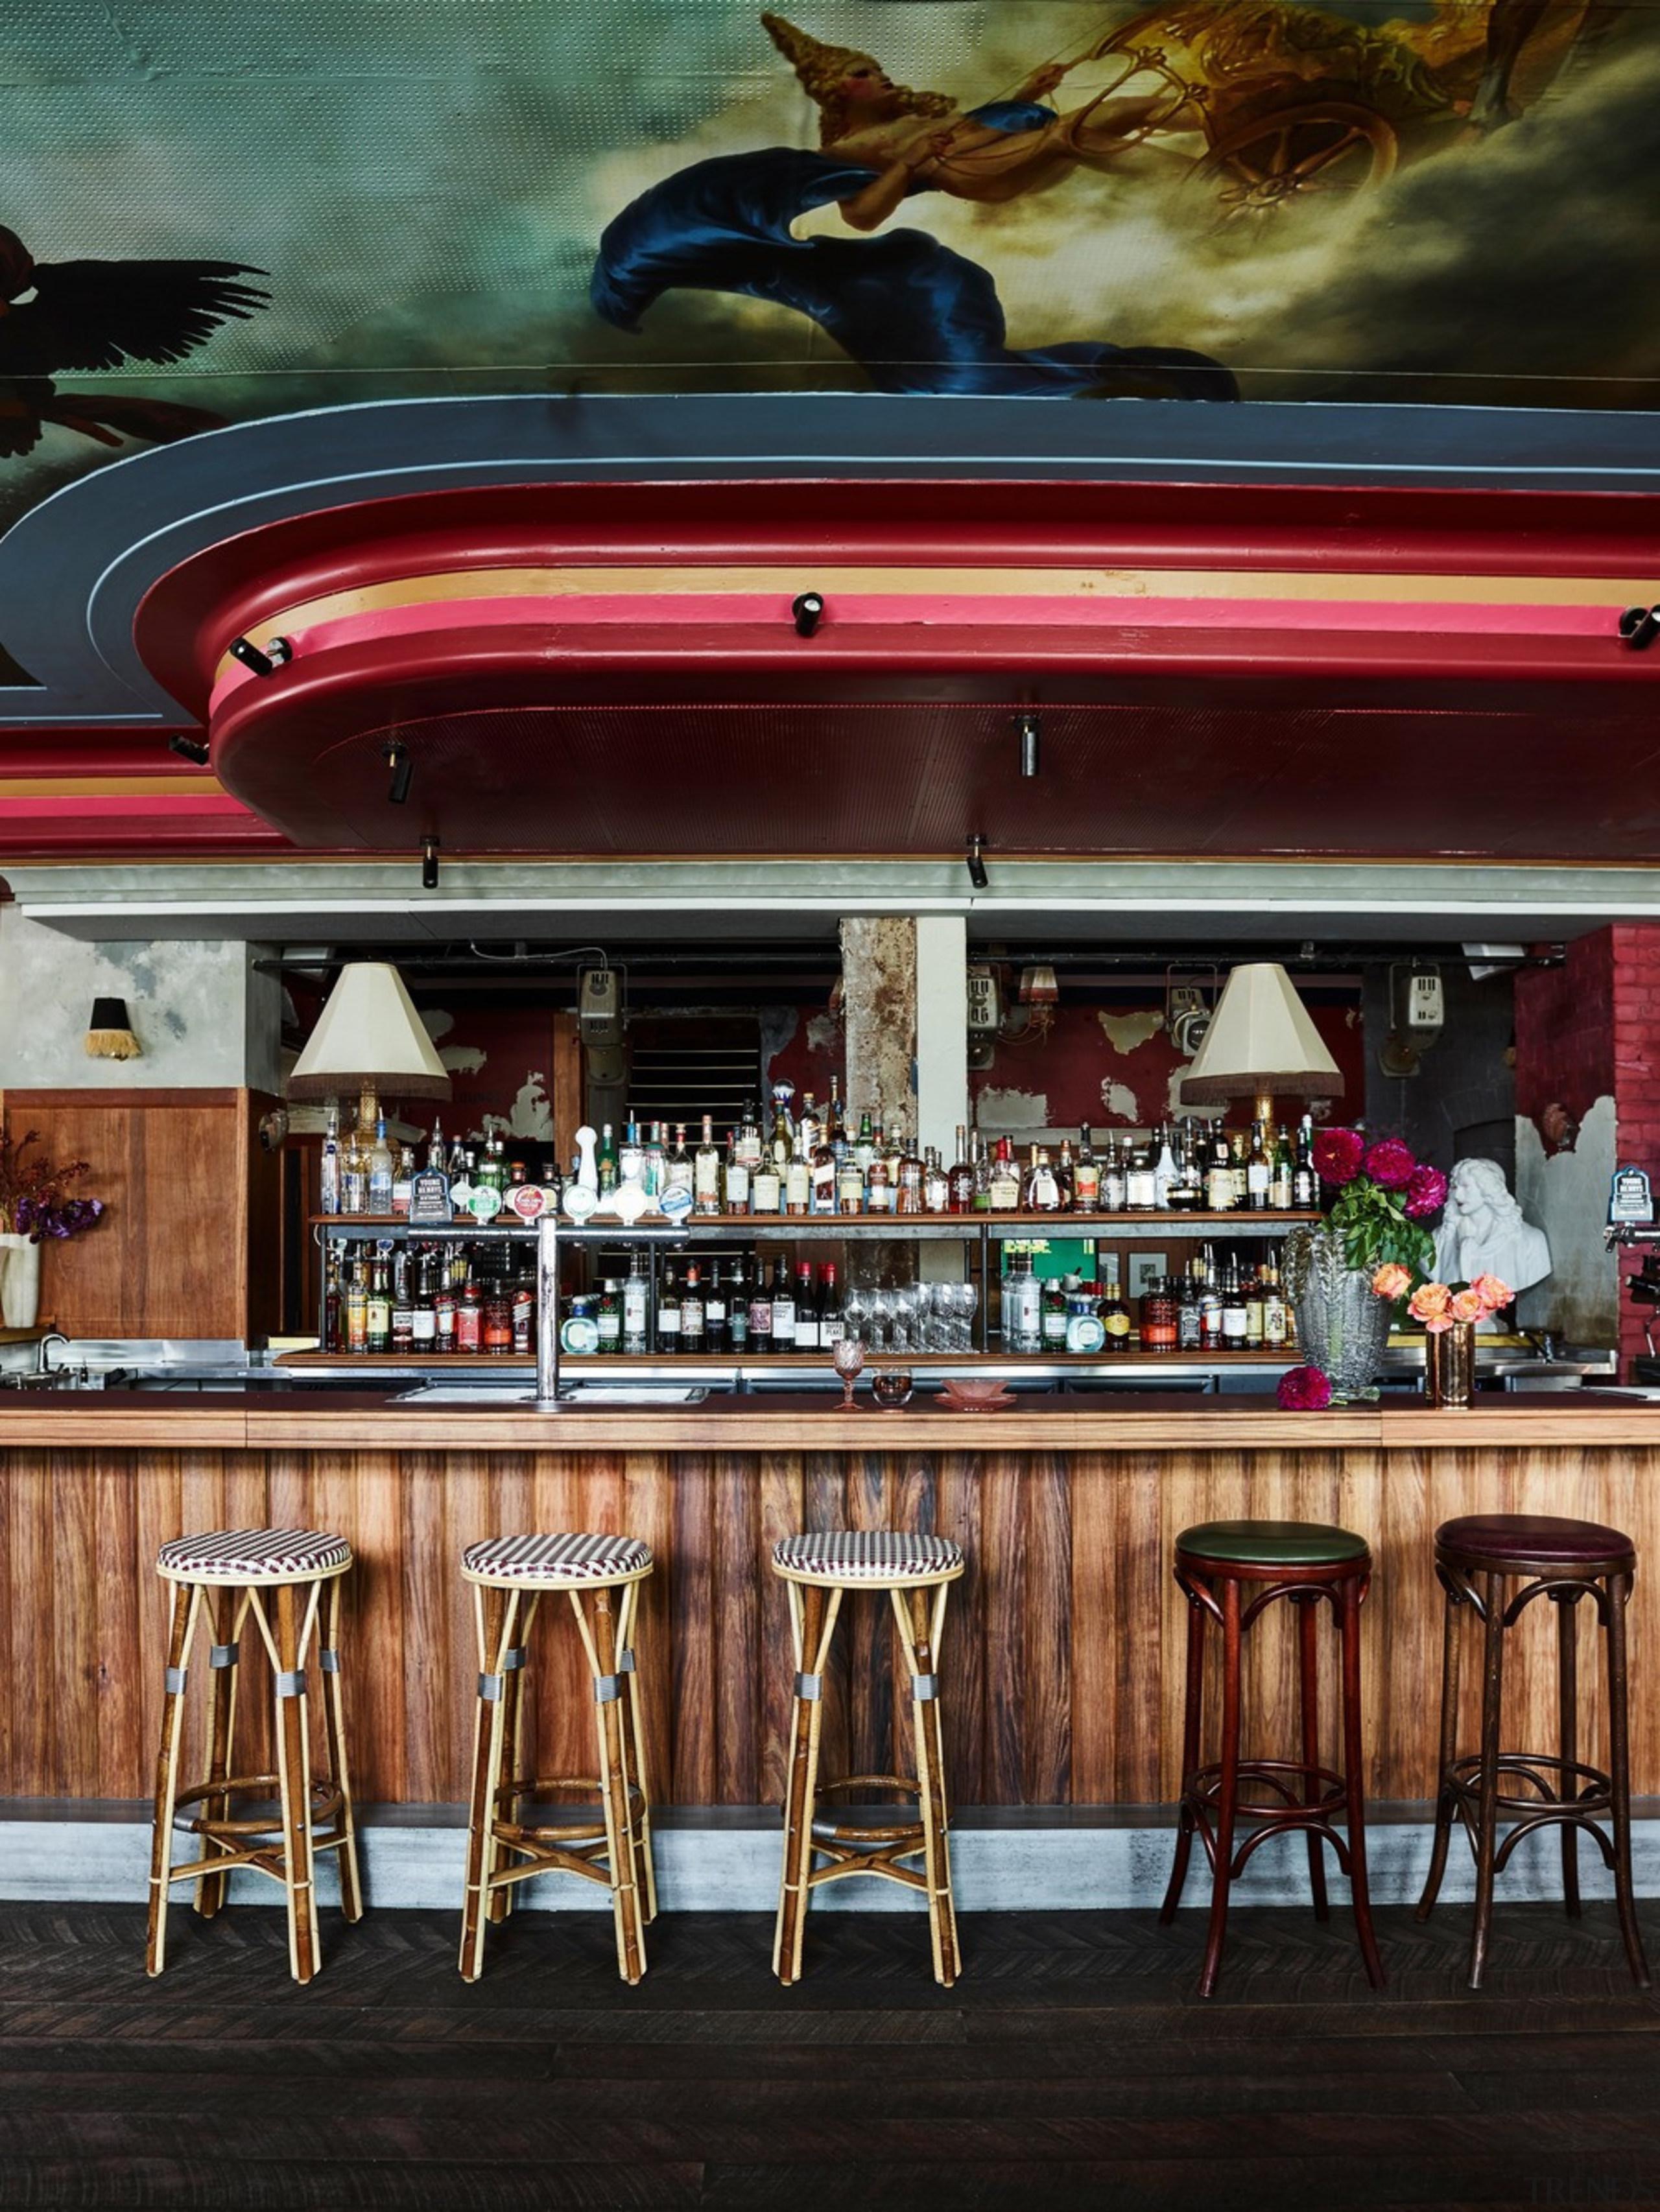 The main bar features a bespoke cathedral-esque/Biblical fresco bar, restaurant, black